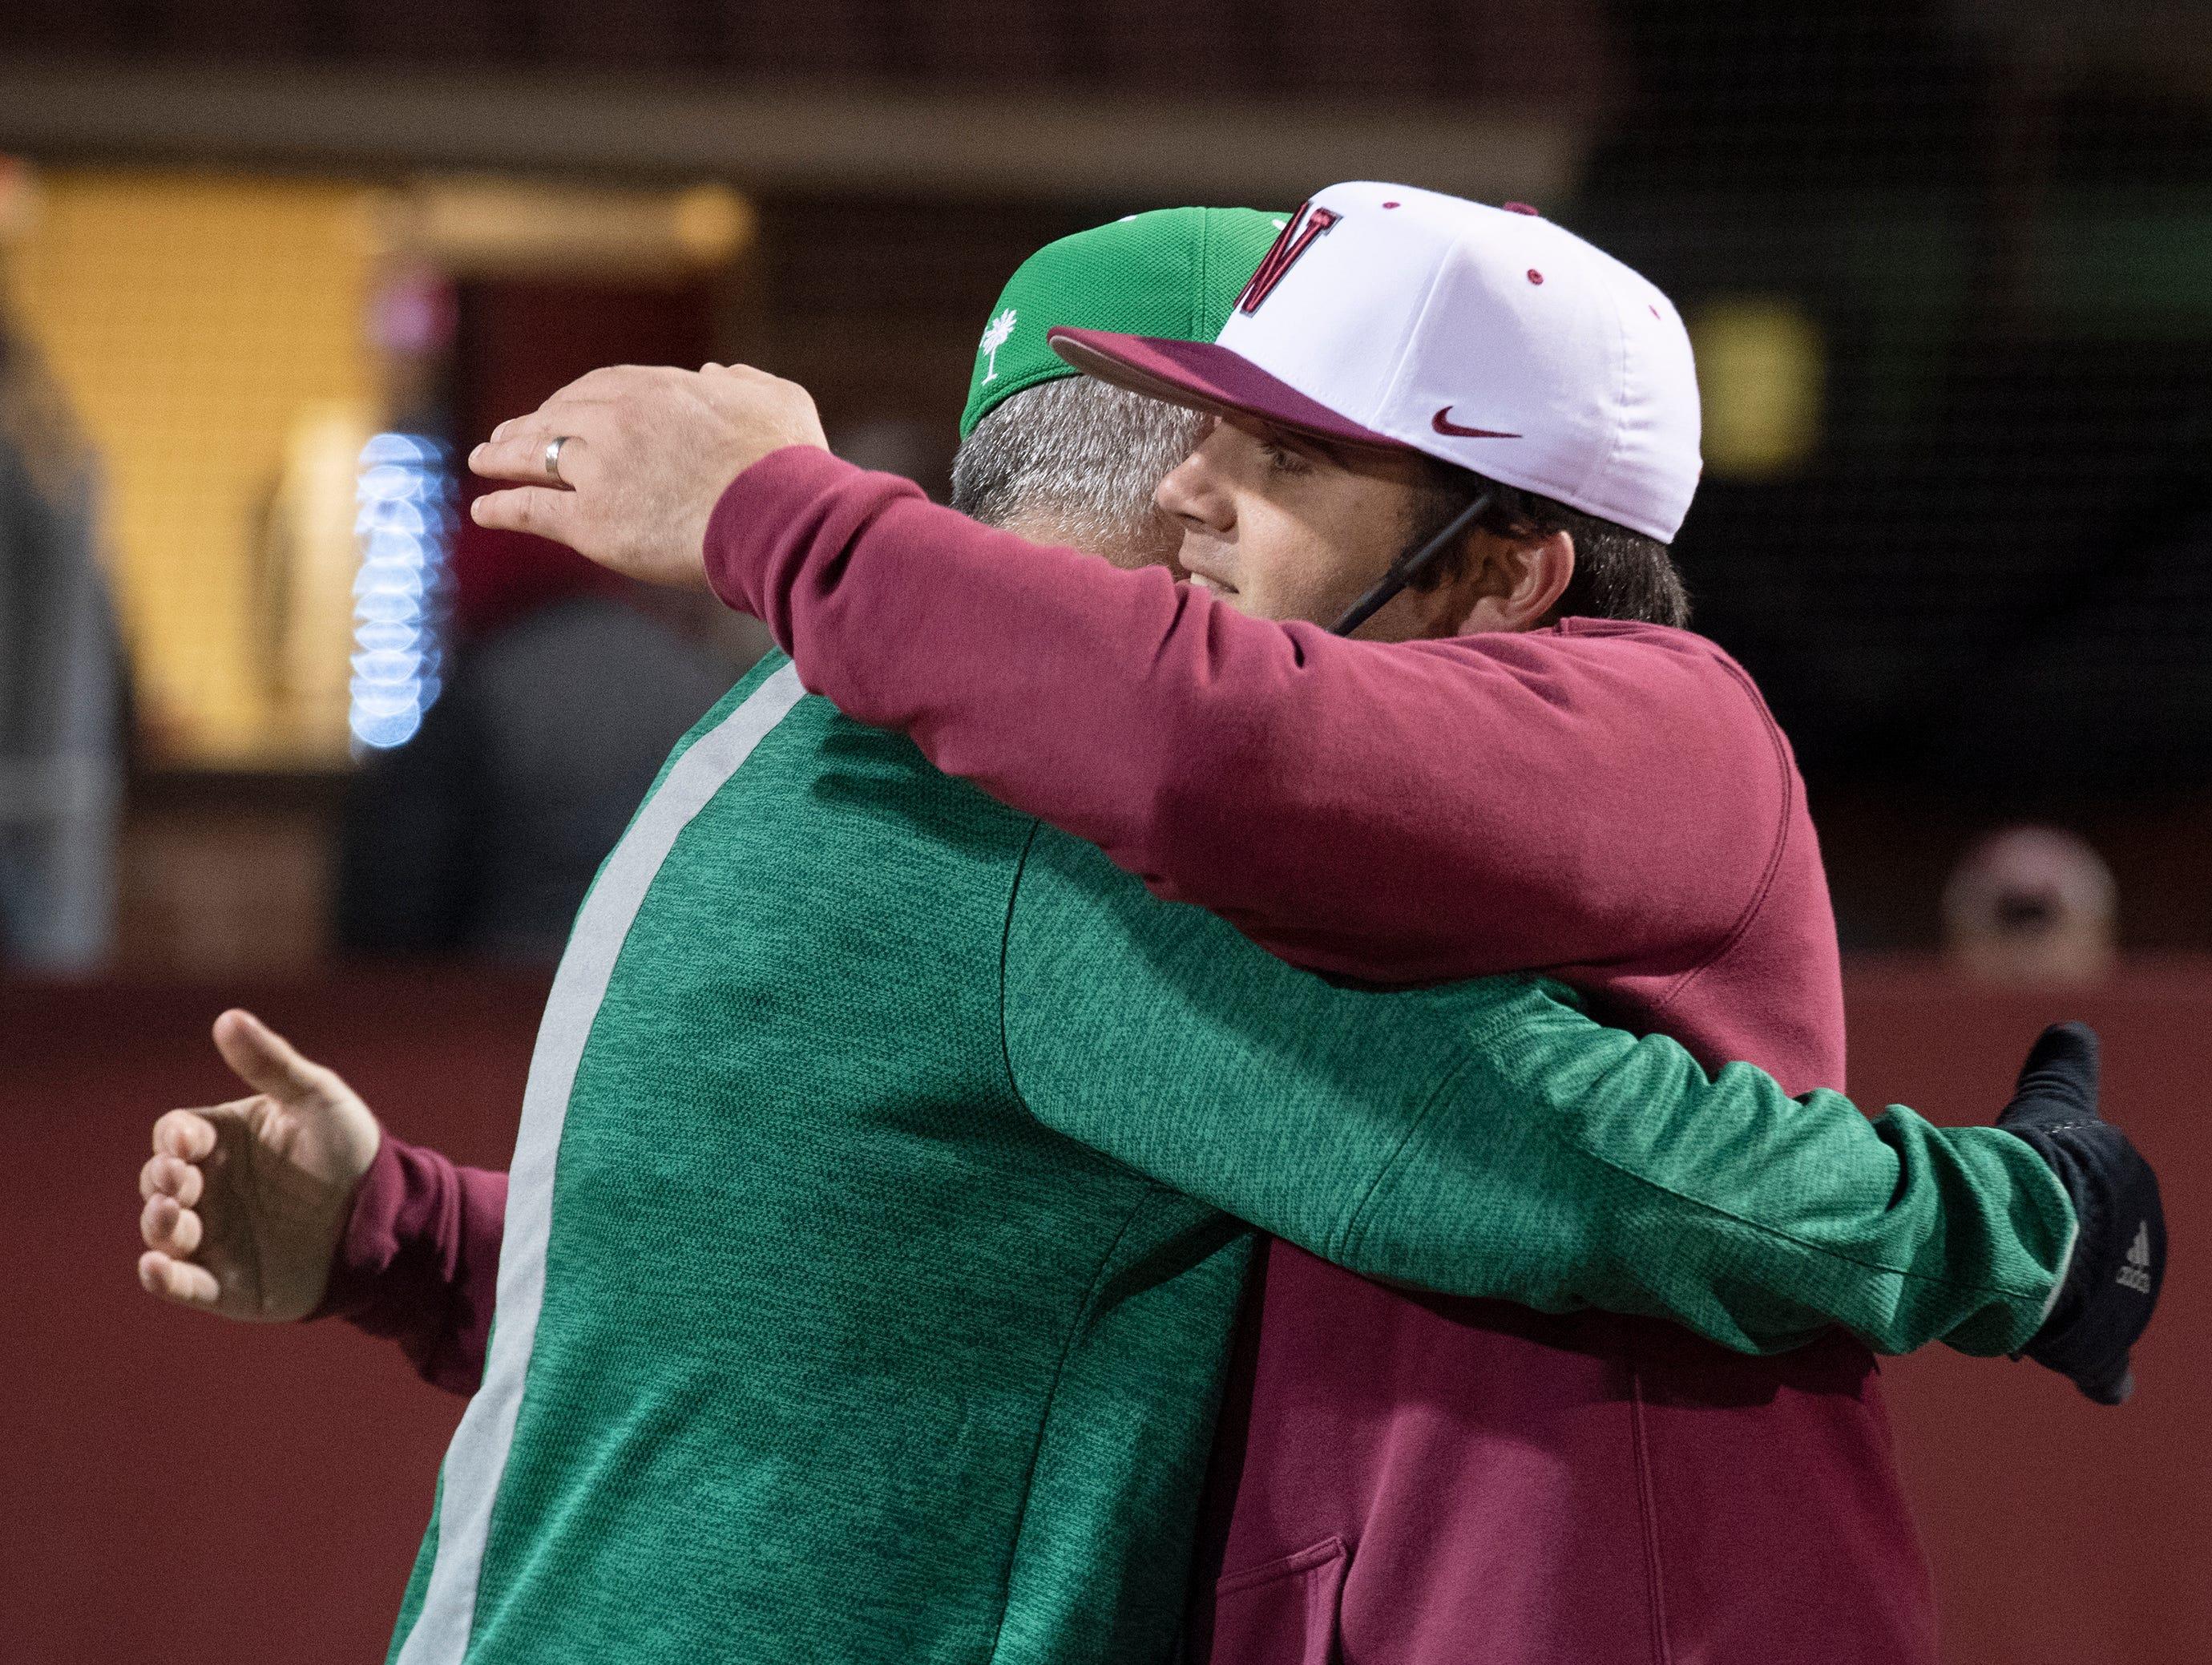 Easley High School head coach Gill Payne (left) and his son Westside High School head coach Jarrod Payne hug after their game at Westside High School Tuesday, Mar. 5, 2019.